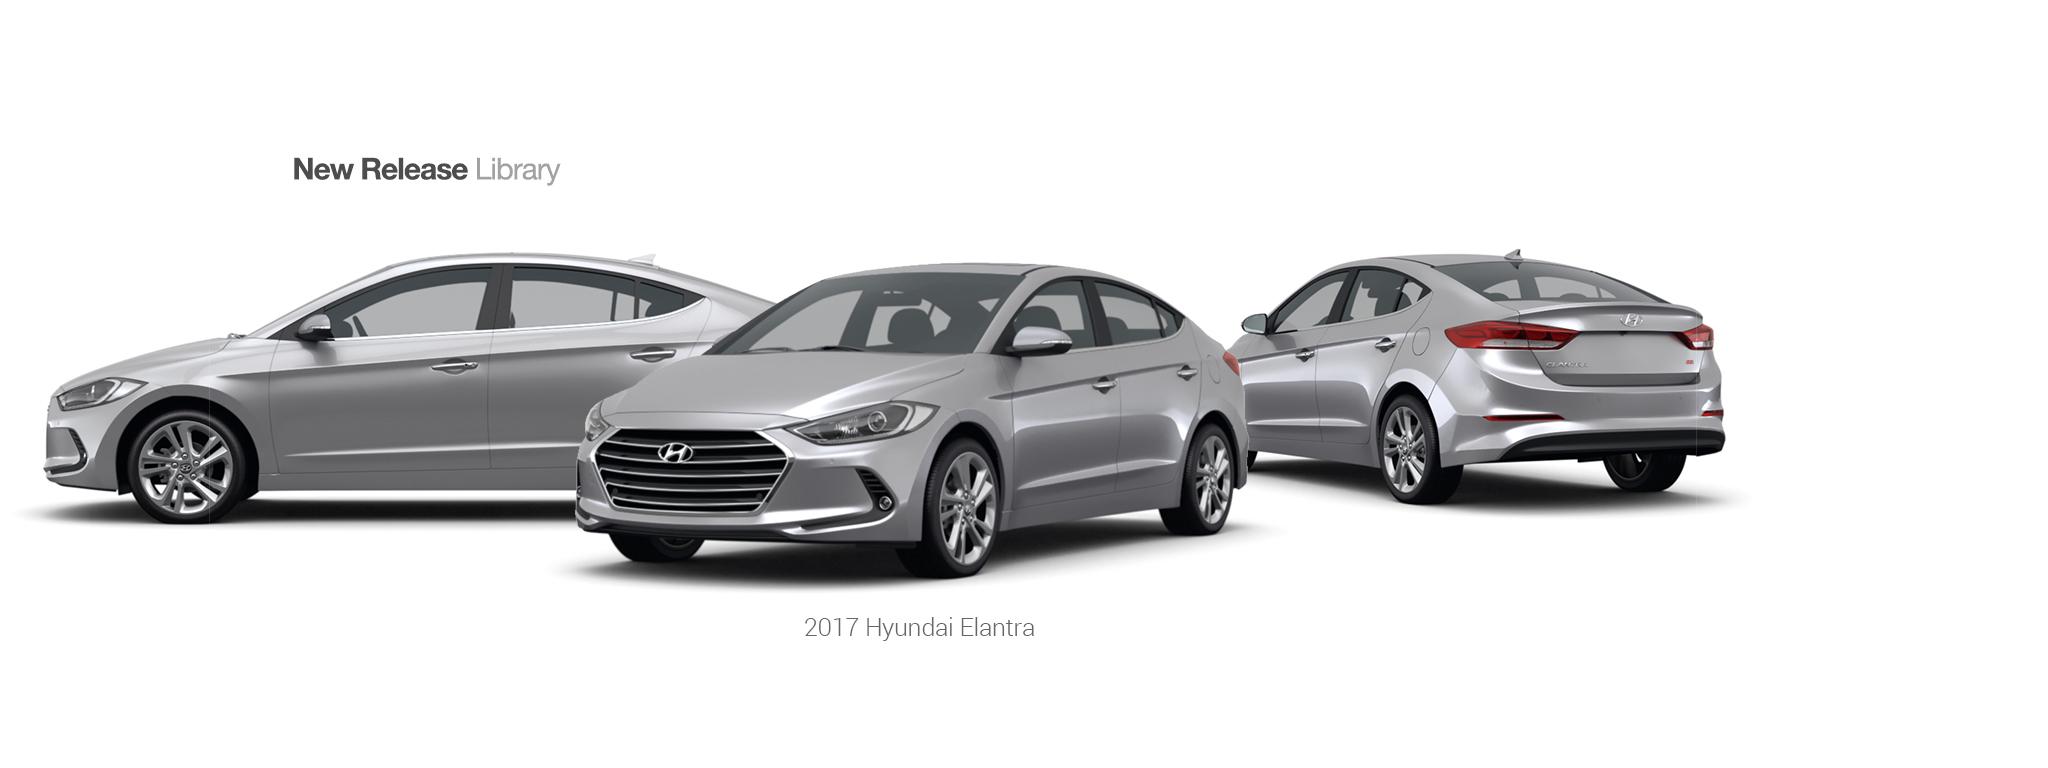 Evoxstock Com Car Stock Photos On Demand